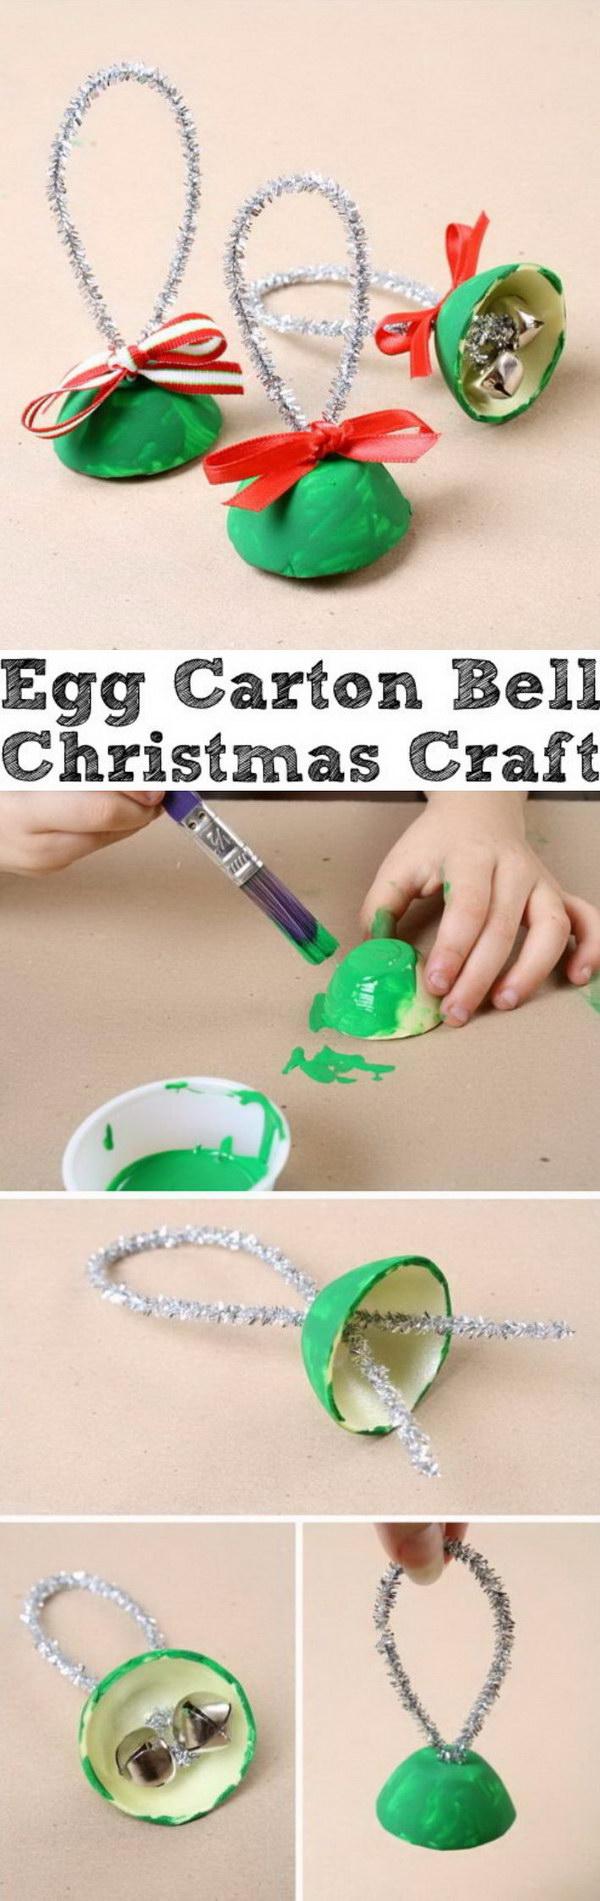 Egg Carton Bell Christmas Craft.